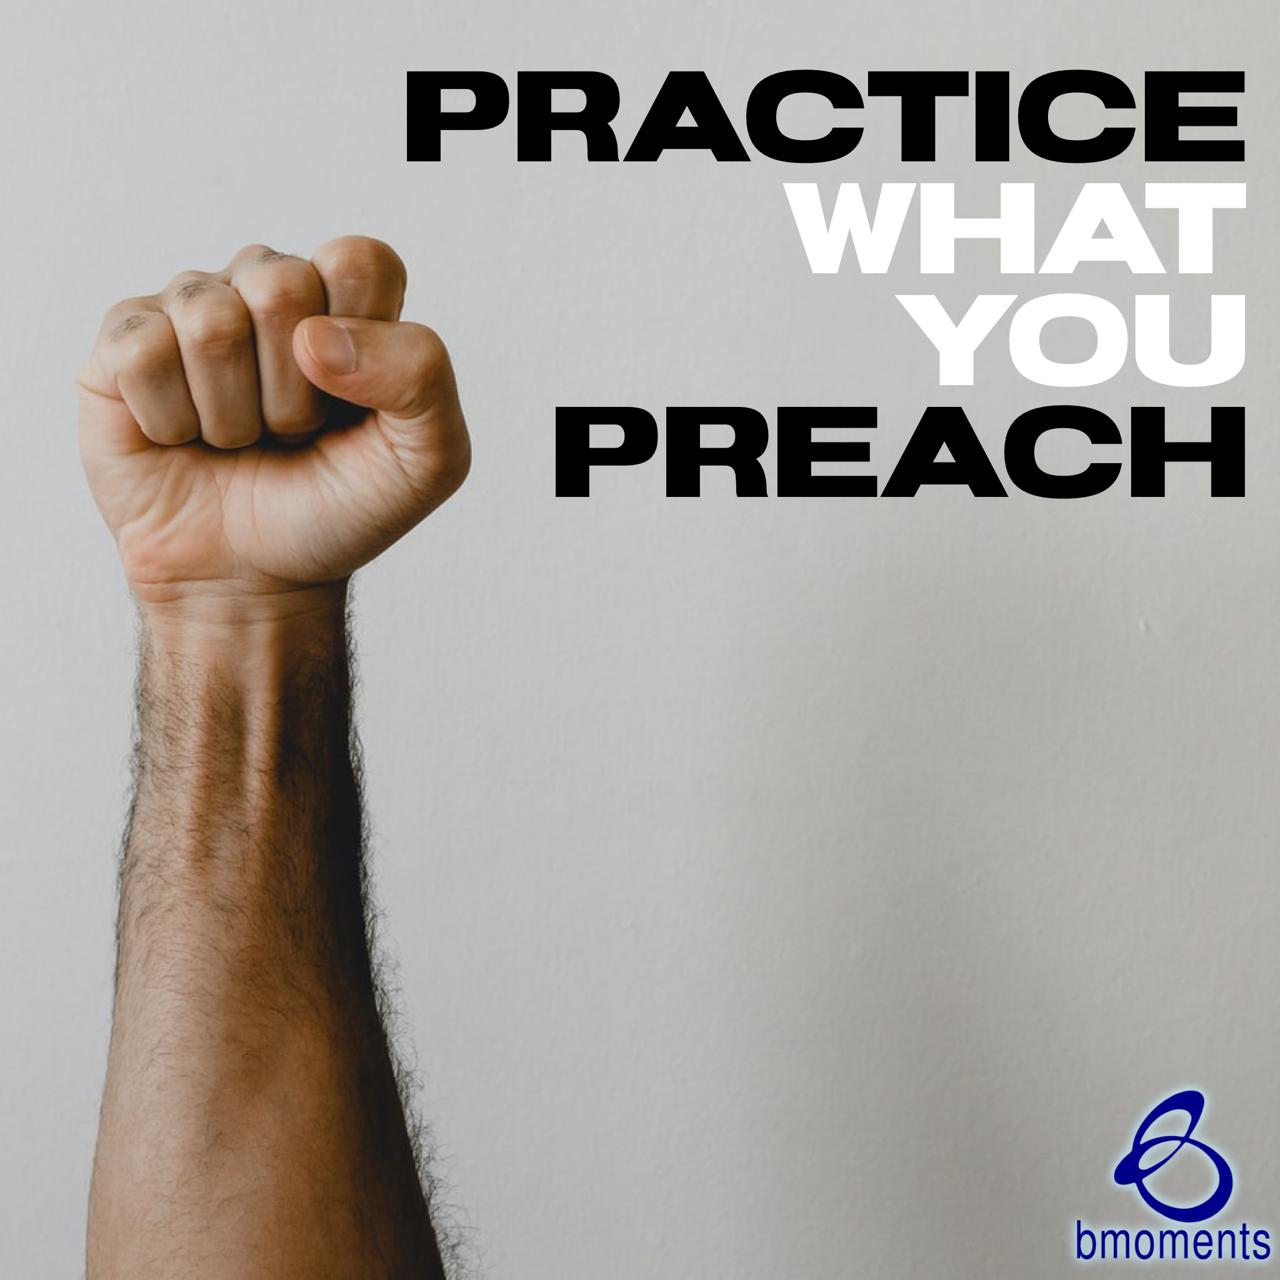 Do You Practice What You Preach?